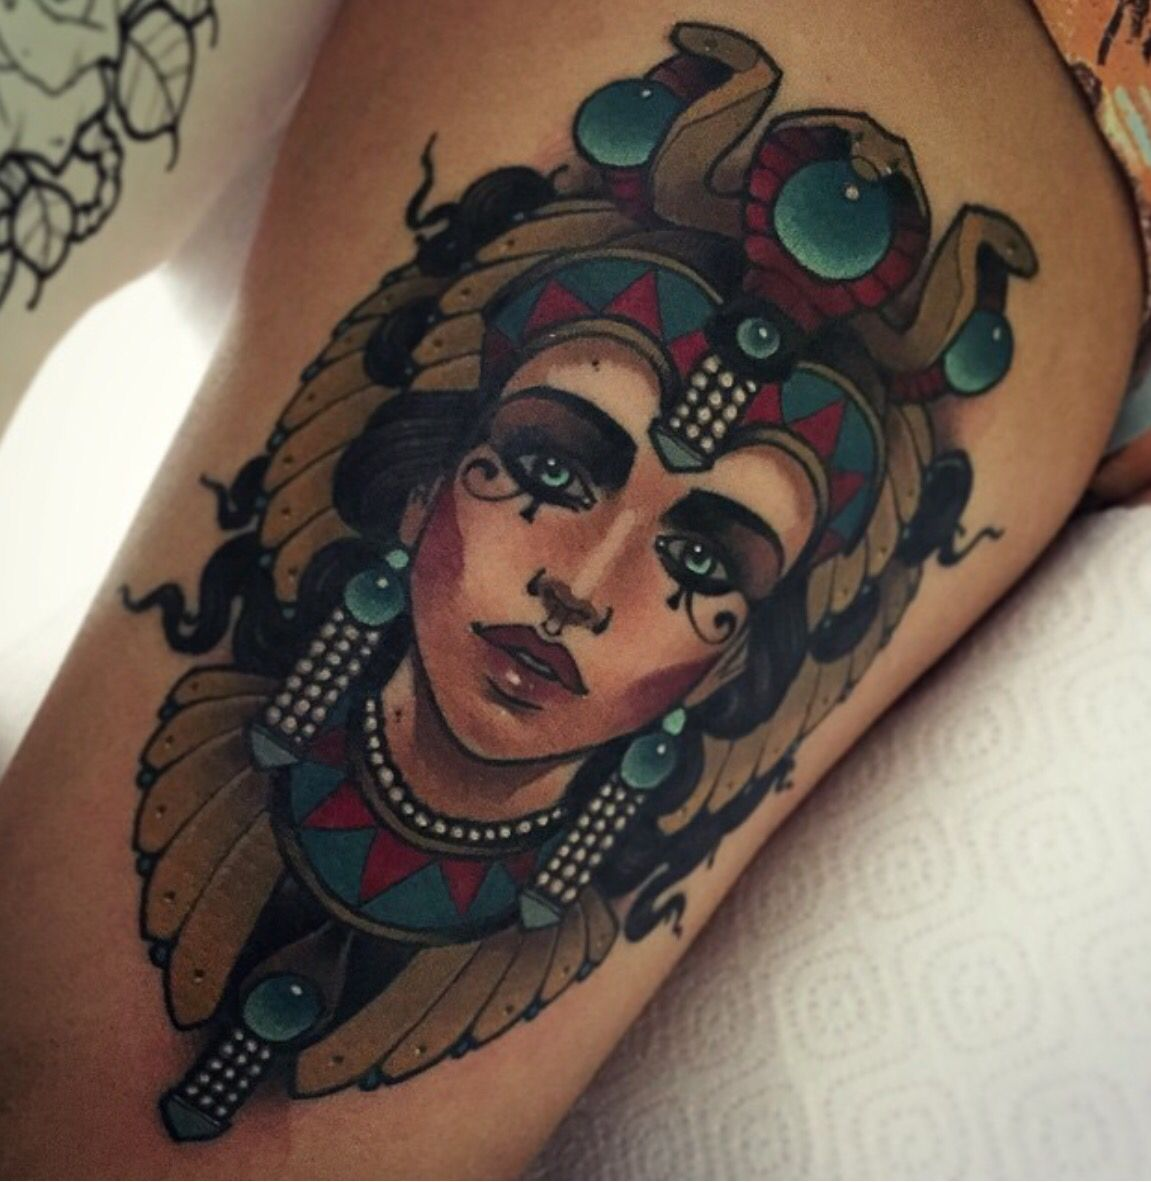 Egyptian Pharaoh Tattoo Tattoo Pra Fazer T Tatuagem